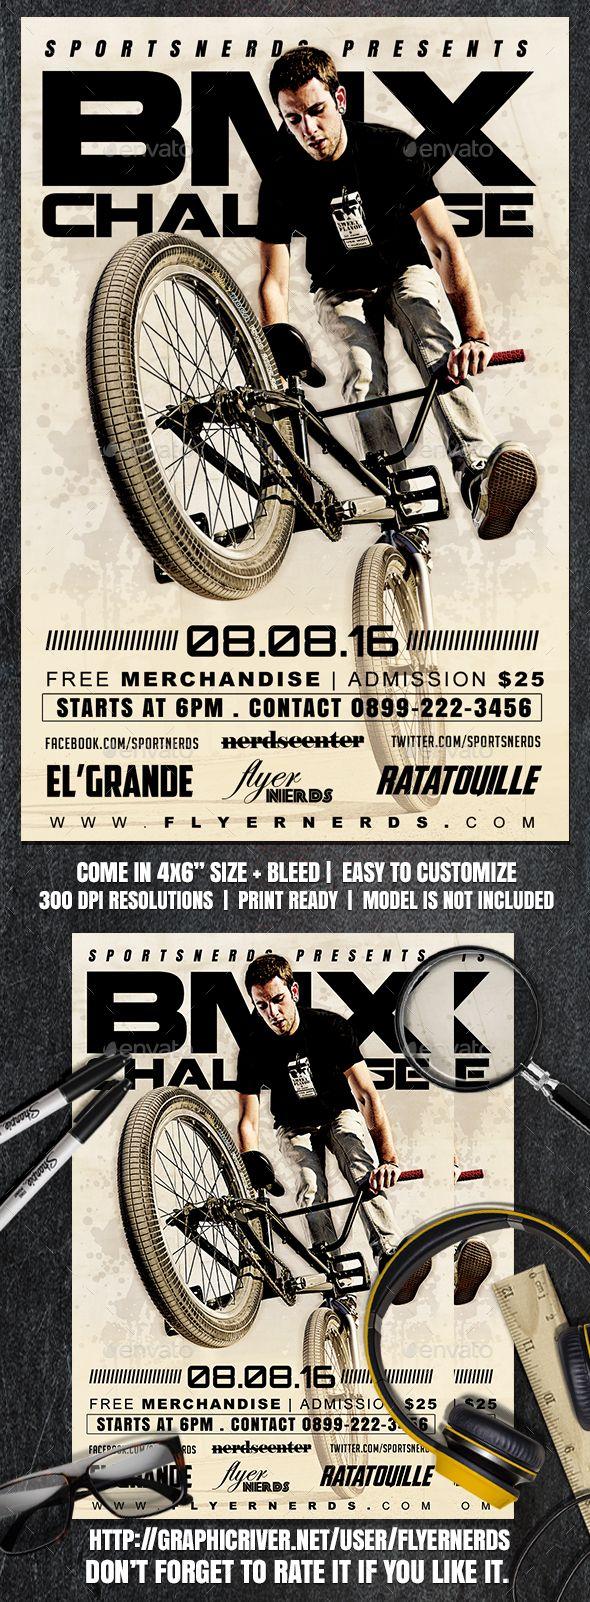 BMX Challenge Sports Flyer Design Template - Sports Events Flyer ...